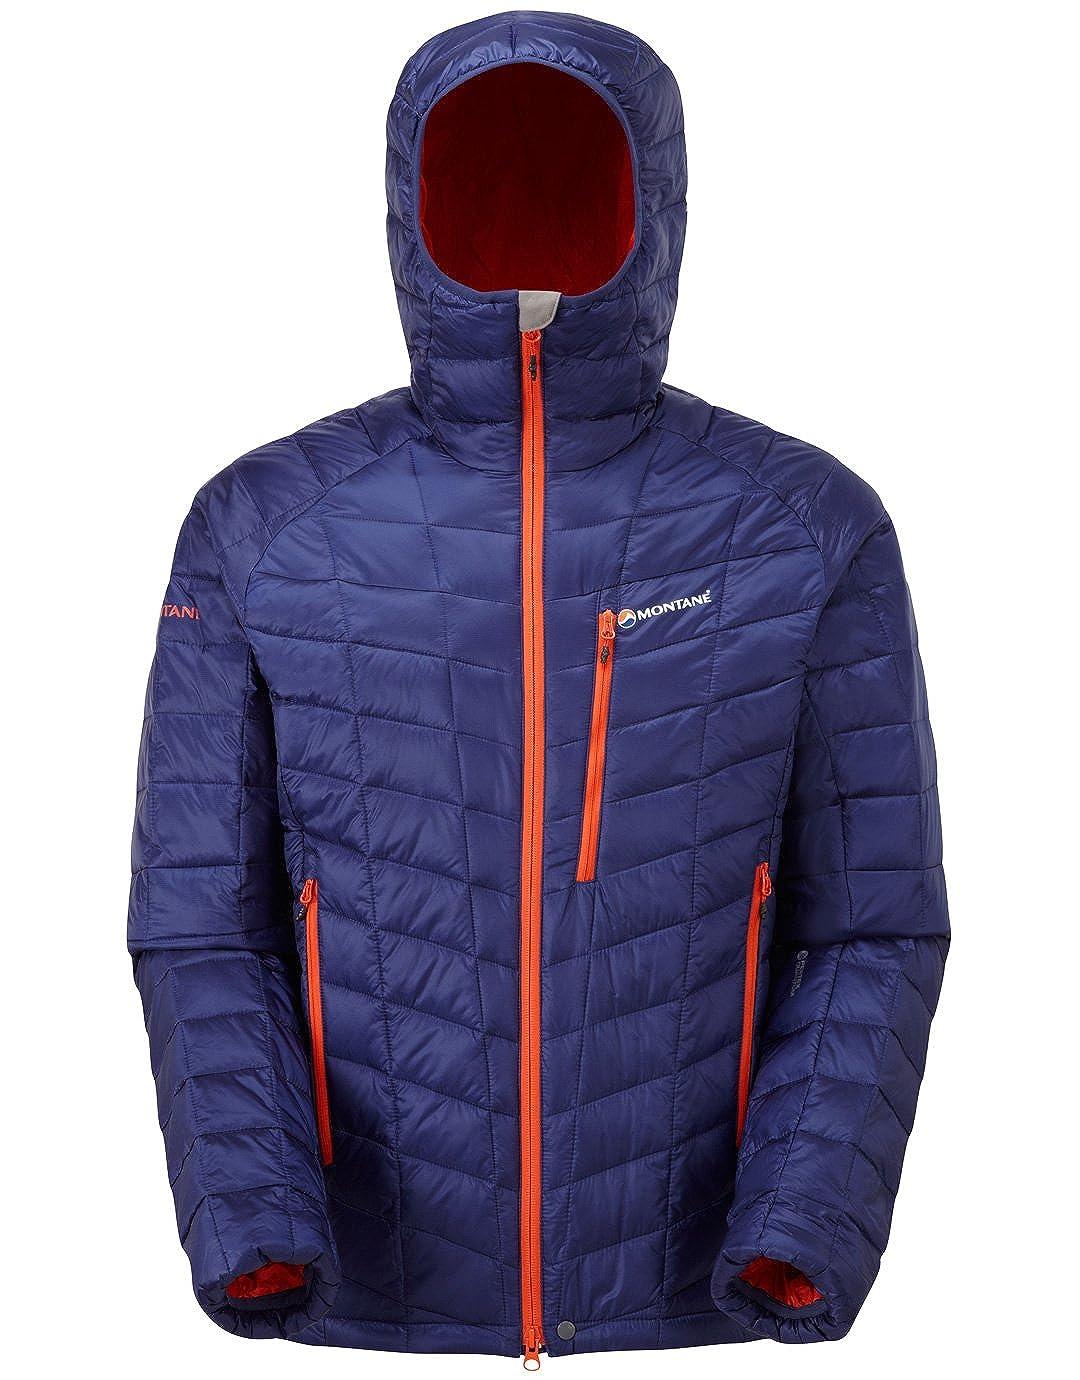 Montane Hola-q chaqueta Luxe